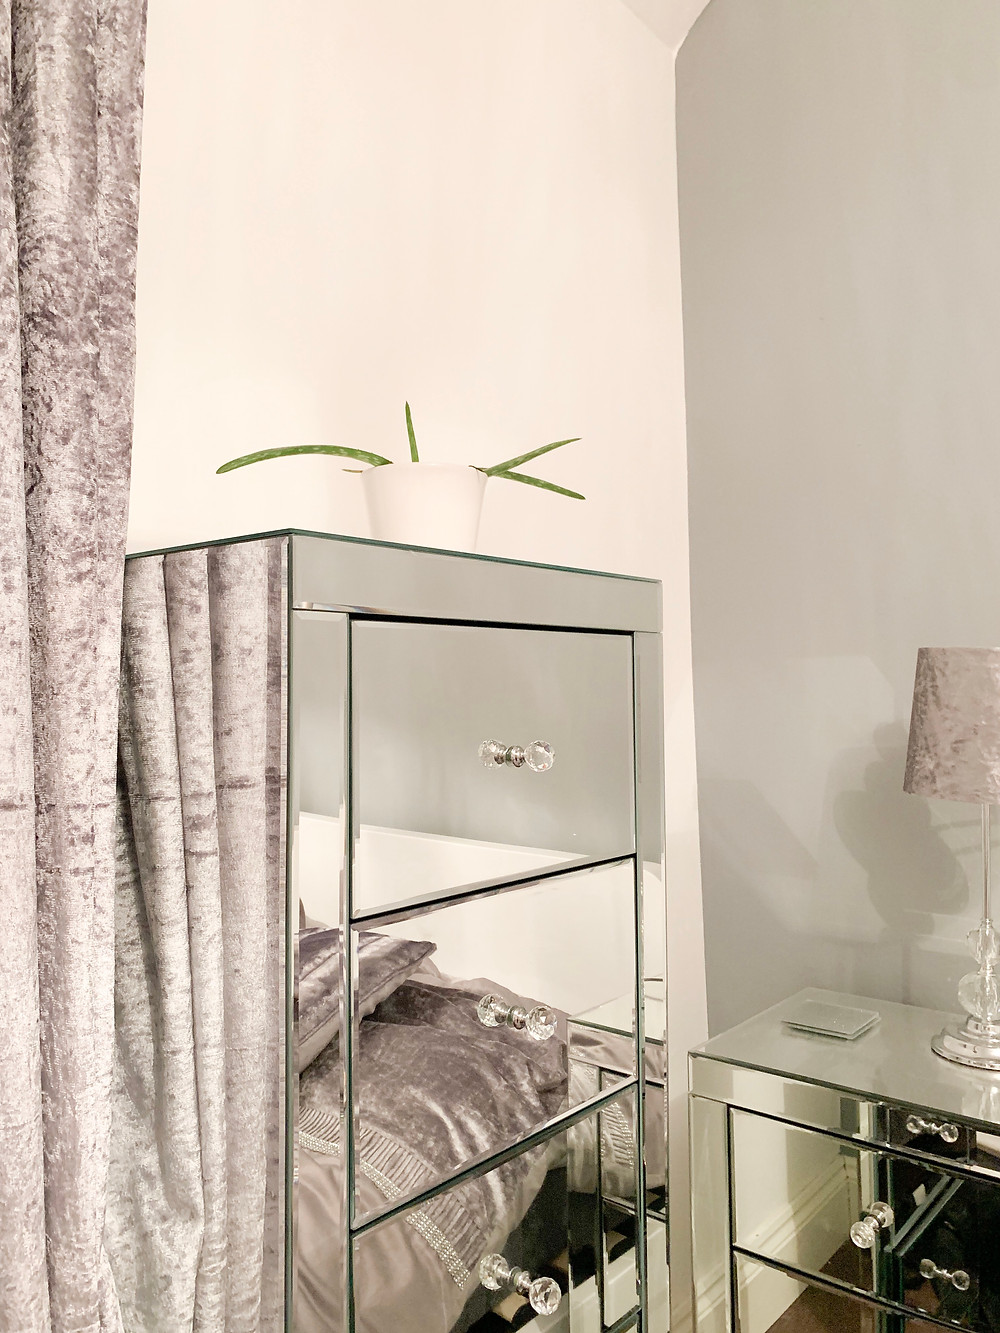 Furniture from Furniture Direct